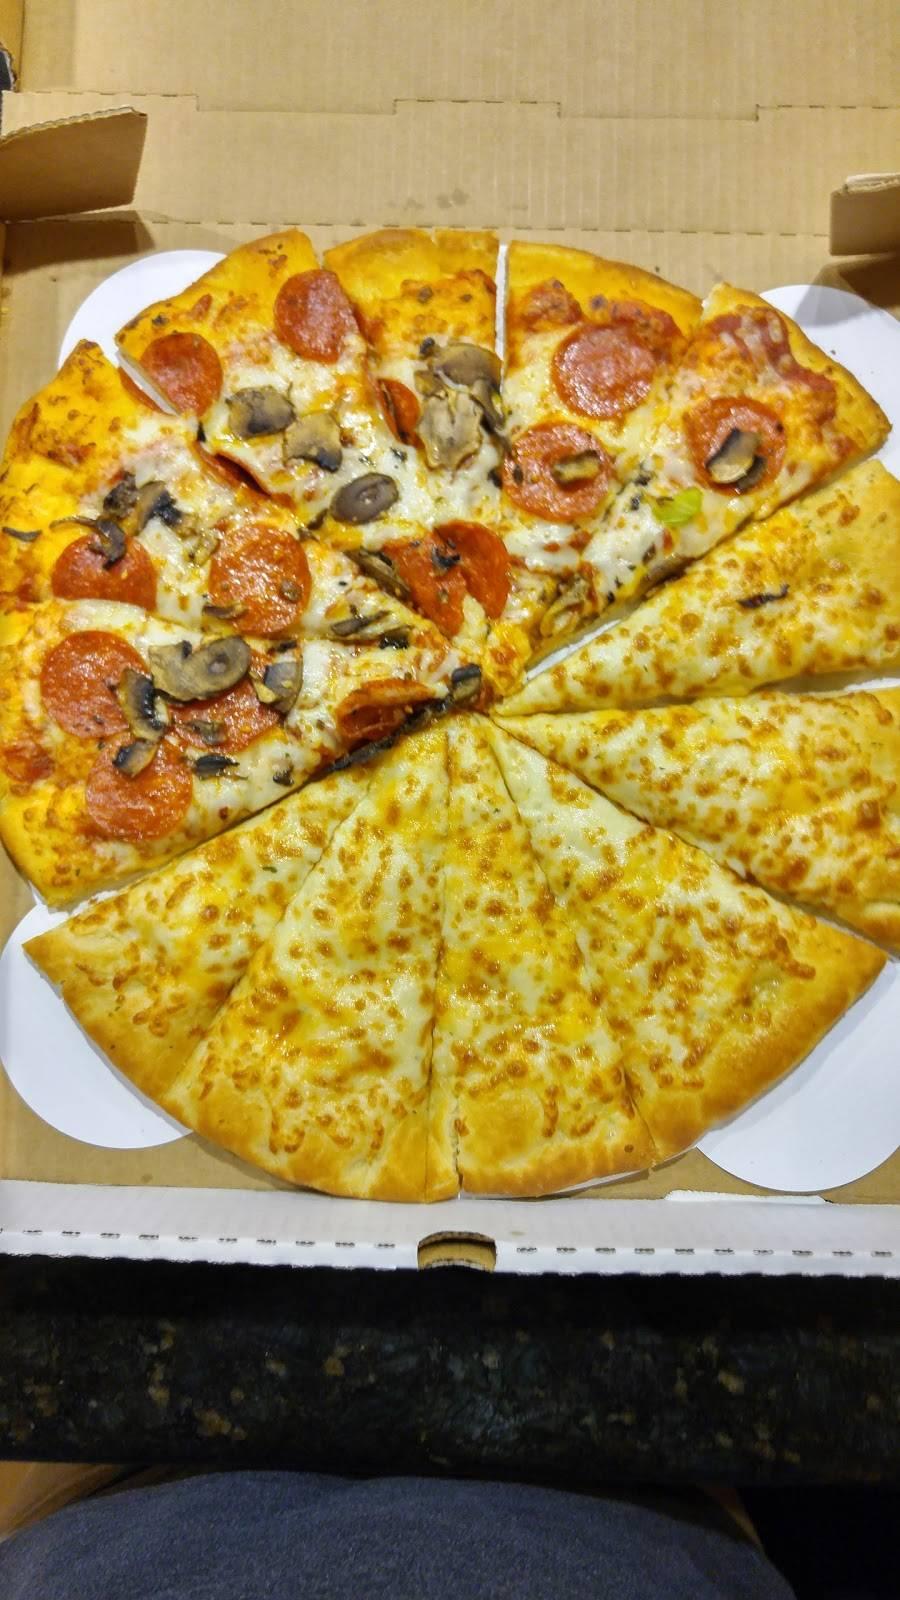 Leonardis Pizza Co. | restaurant | 42600 Jackson St, Indio, CA 92203, USA | 7603426457 OR +1 760-342-6457